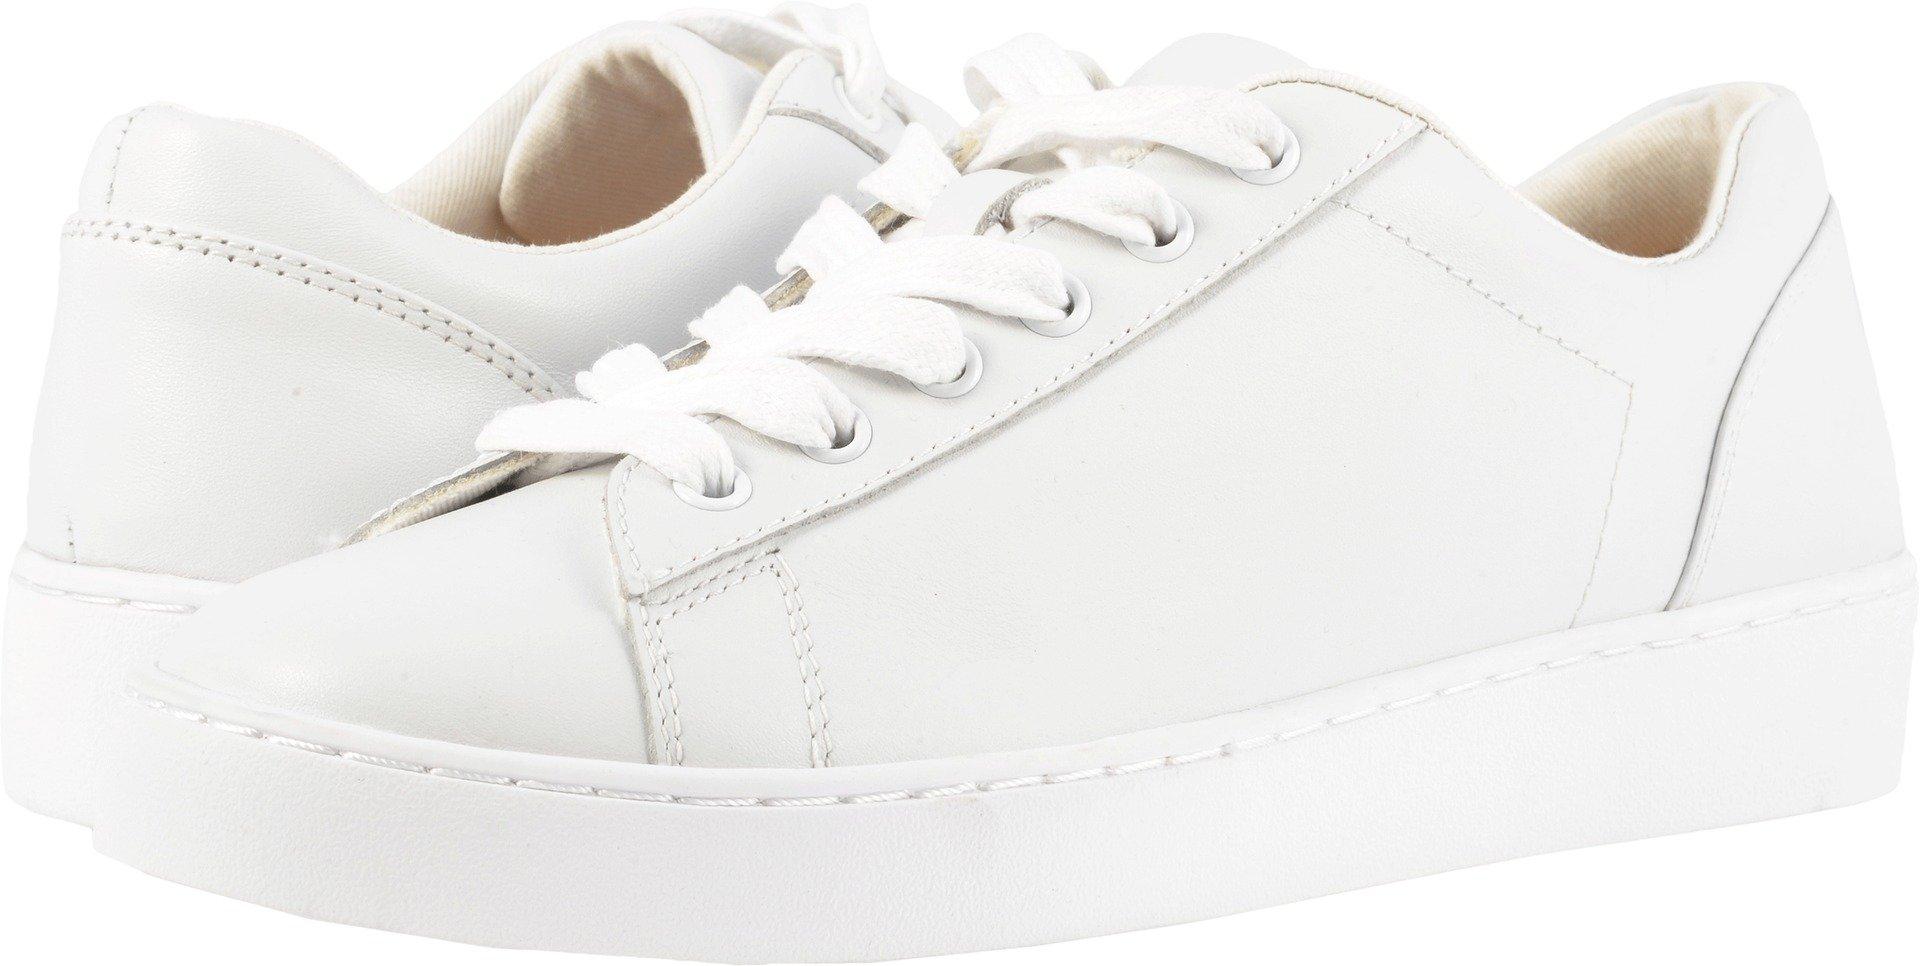 Vionic Women's Syra Casual Sneaker White 6.5 M